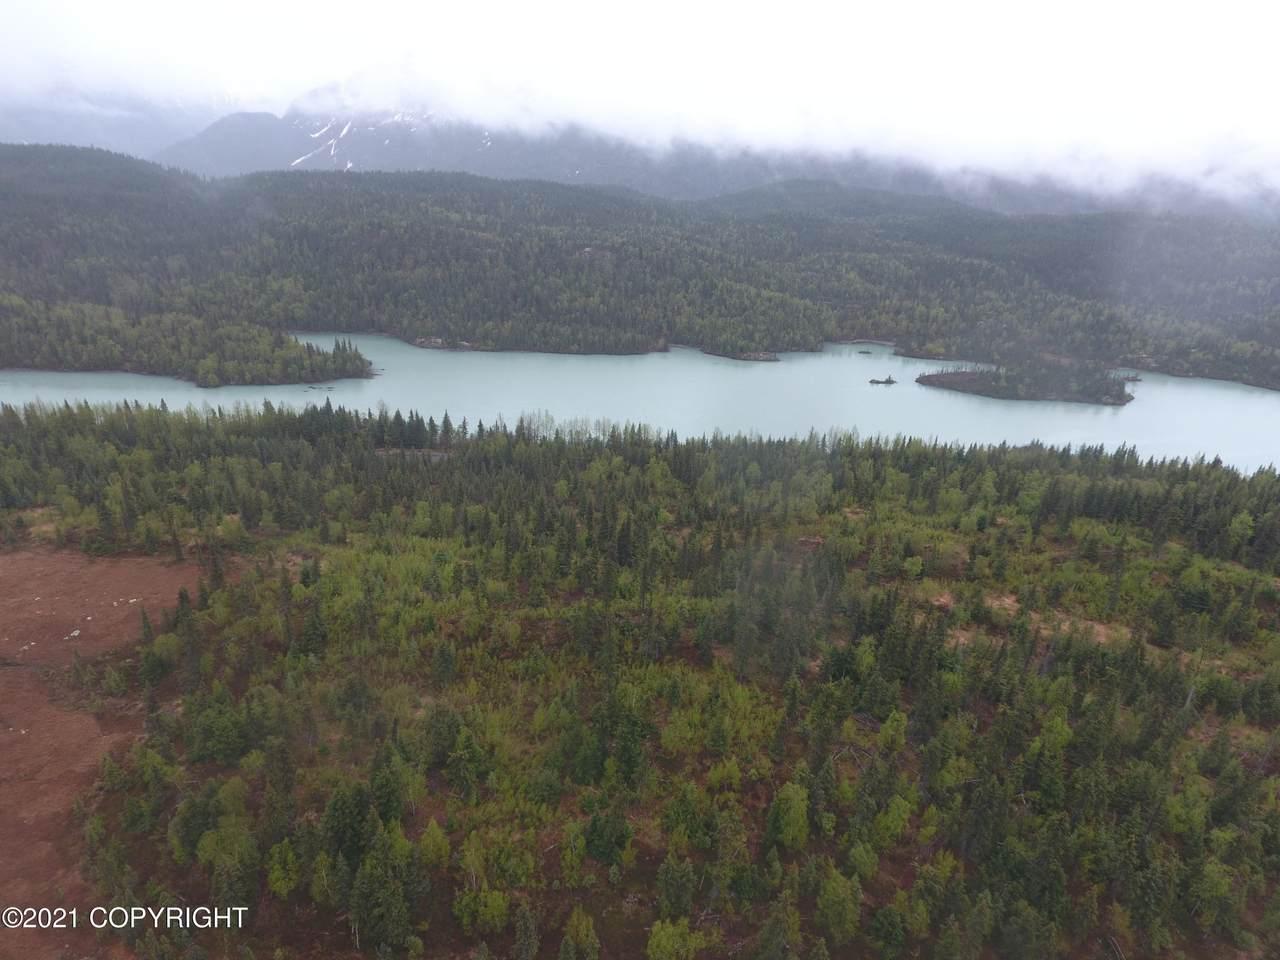 https://bt-photos.global.ssl.fastly.net/alaska/1280_boomver_1_21-8164-2.jpg